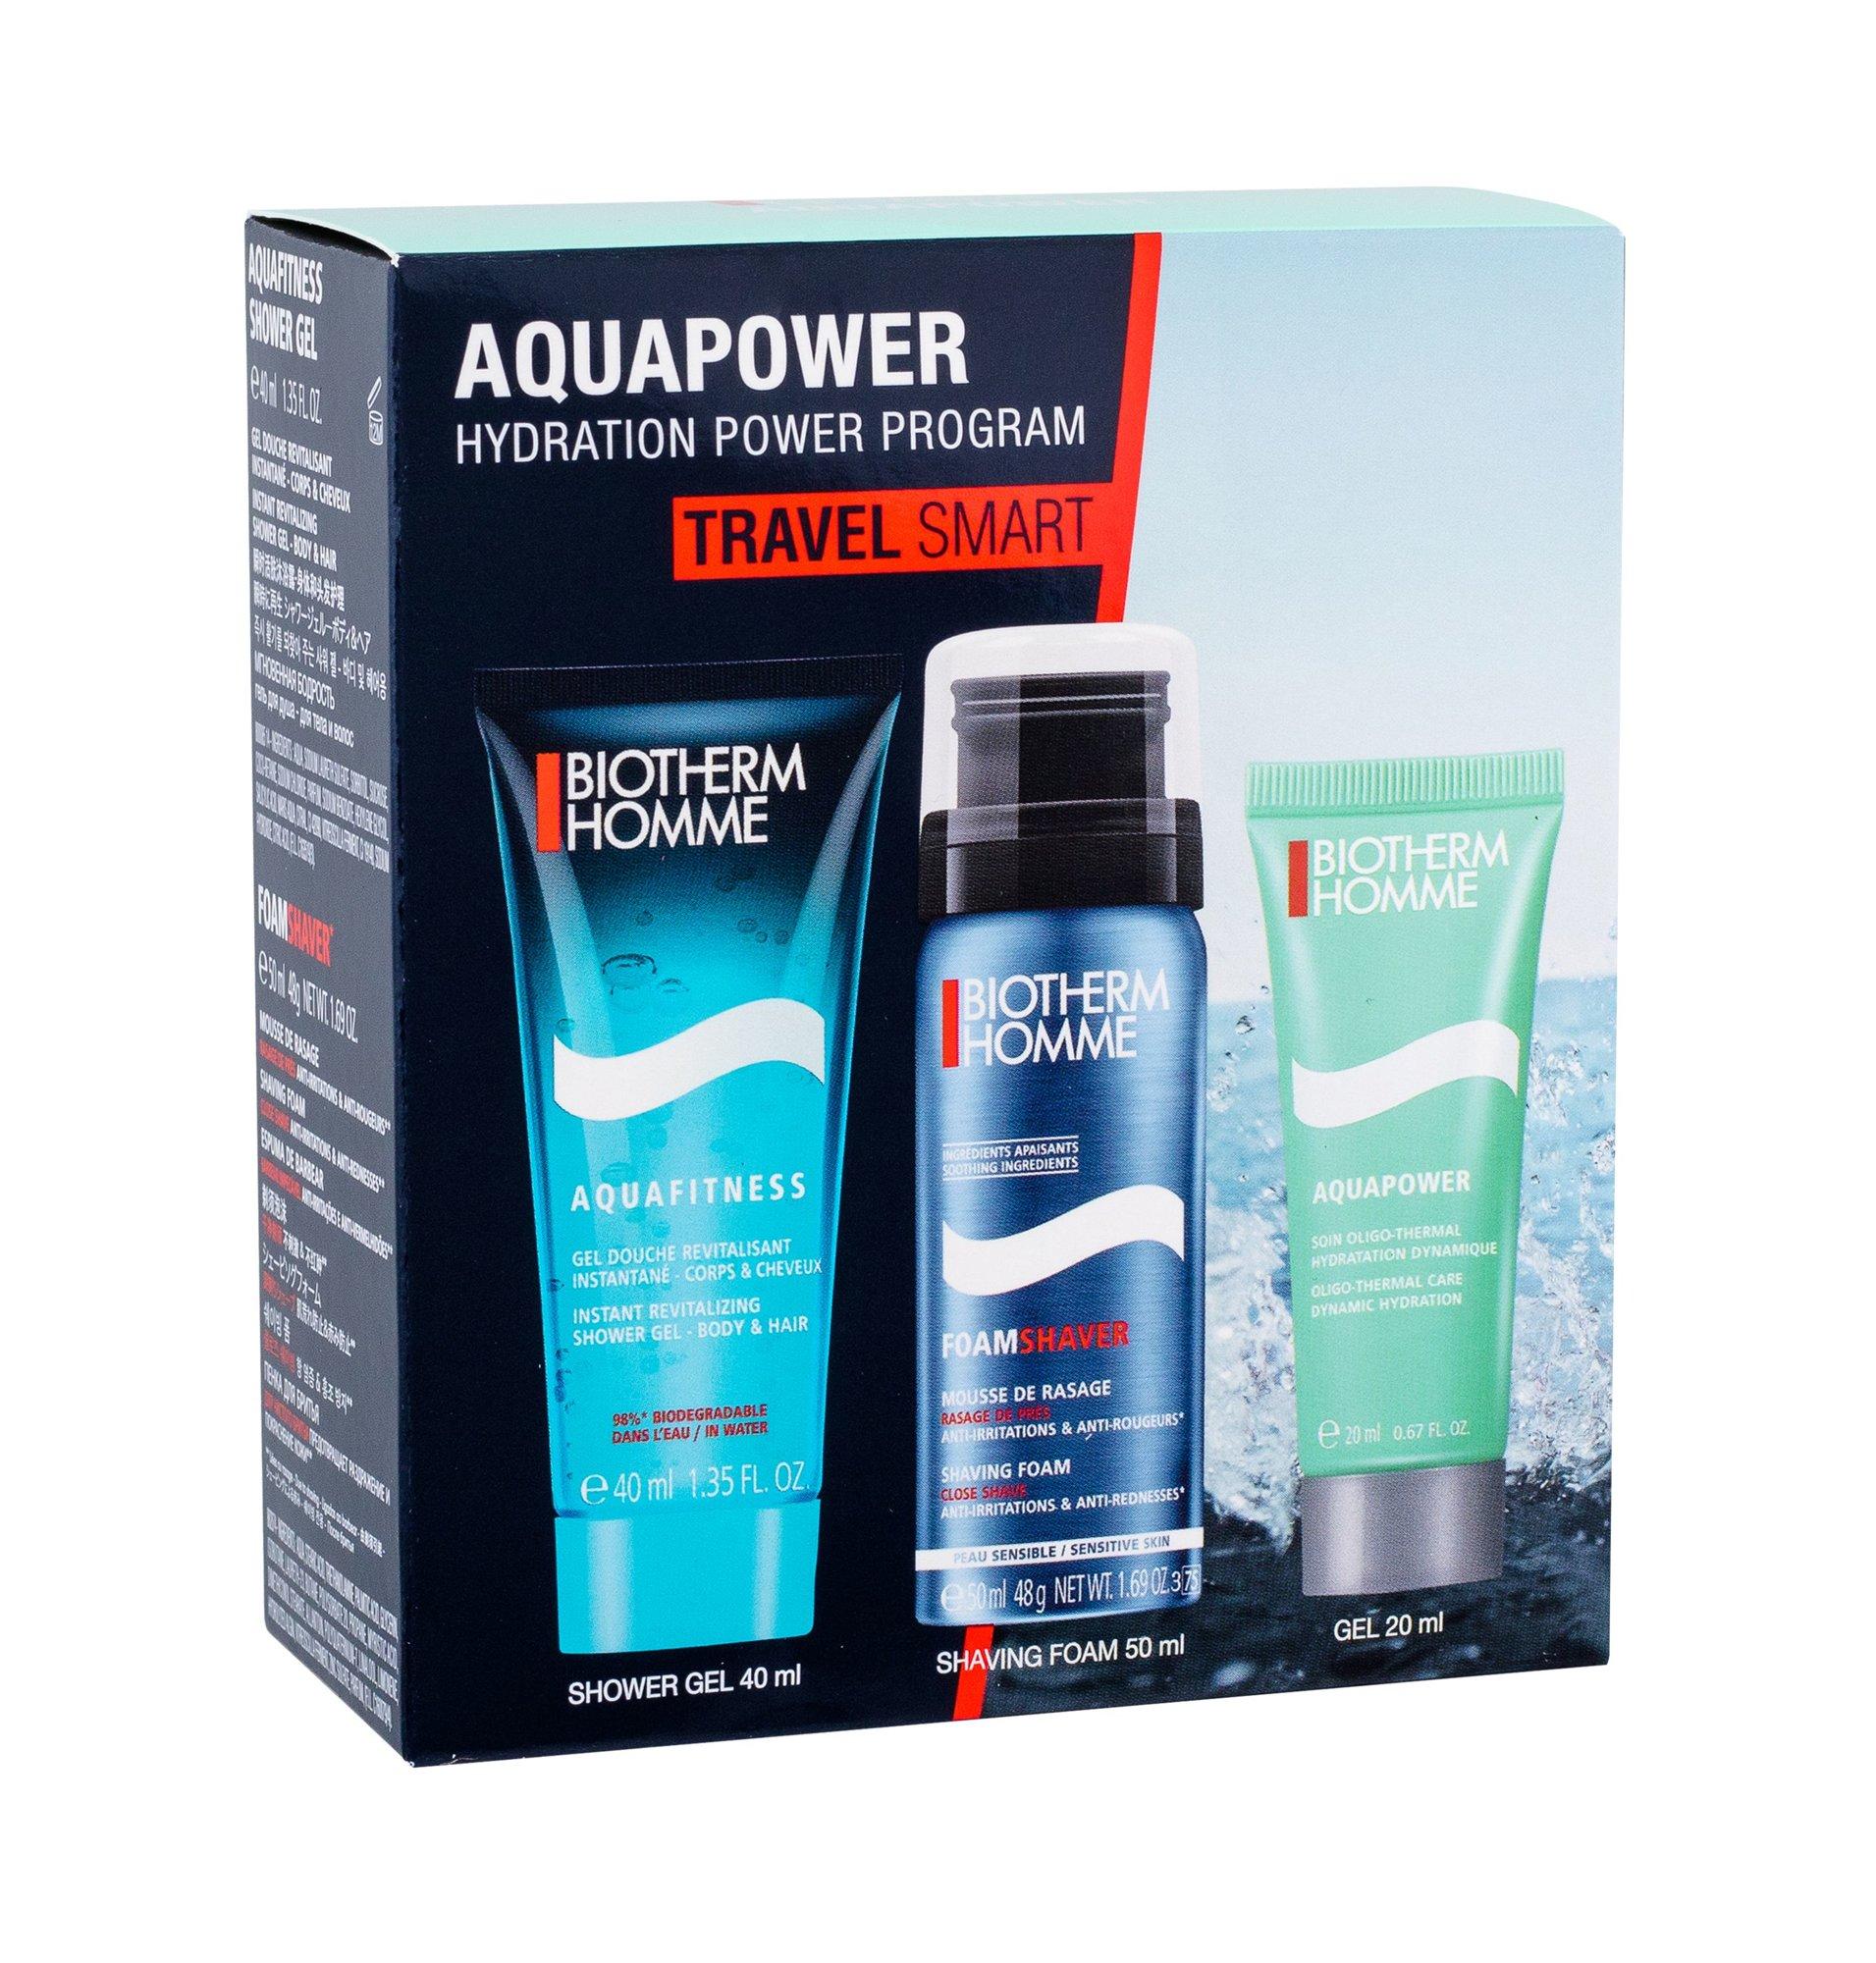 Biotherm Homme Aquafitness Shower Gel 40ml